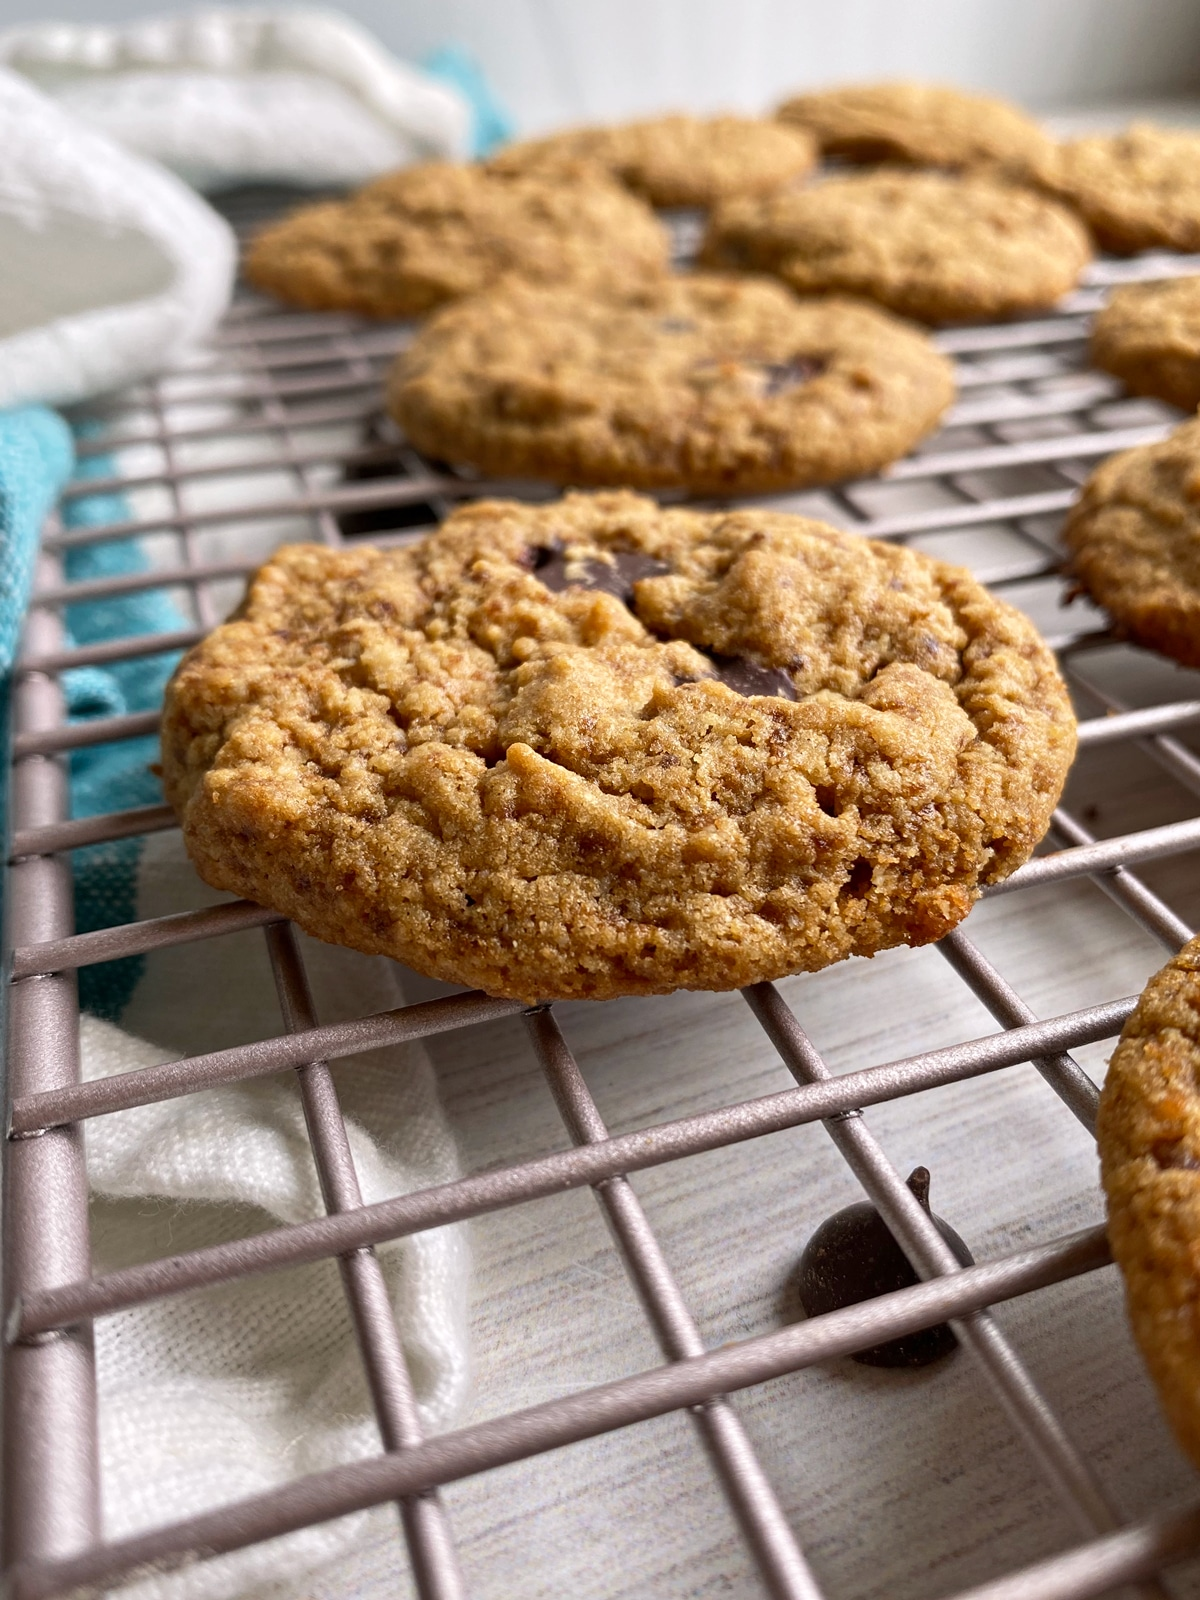 vanilla-protein-powder-cookies-side-view